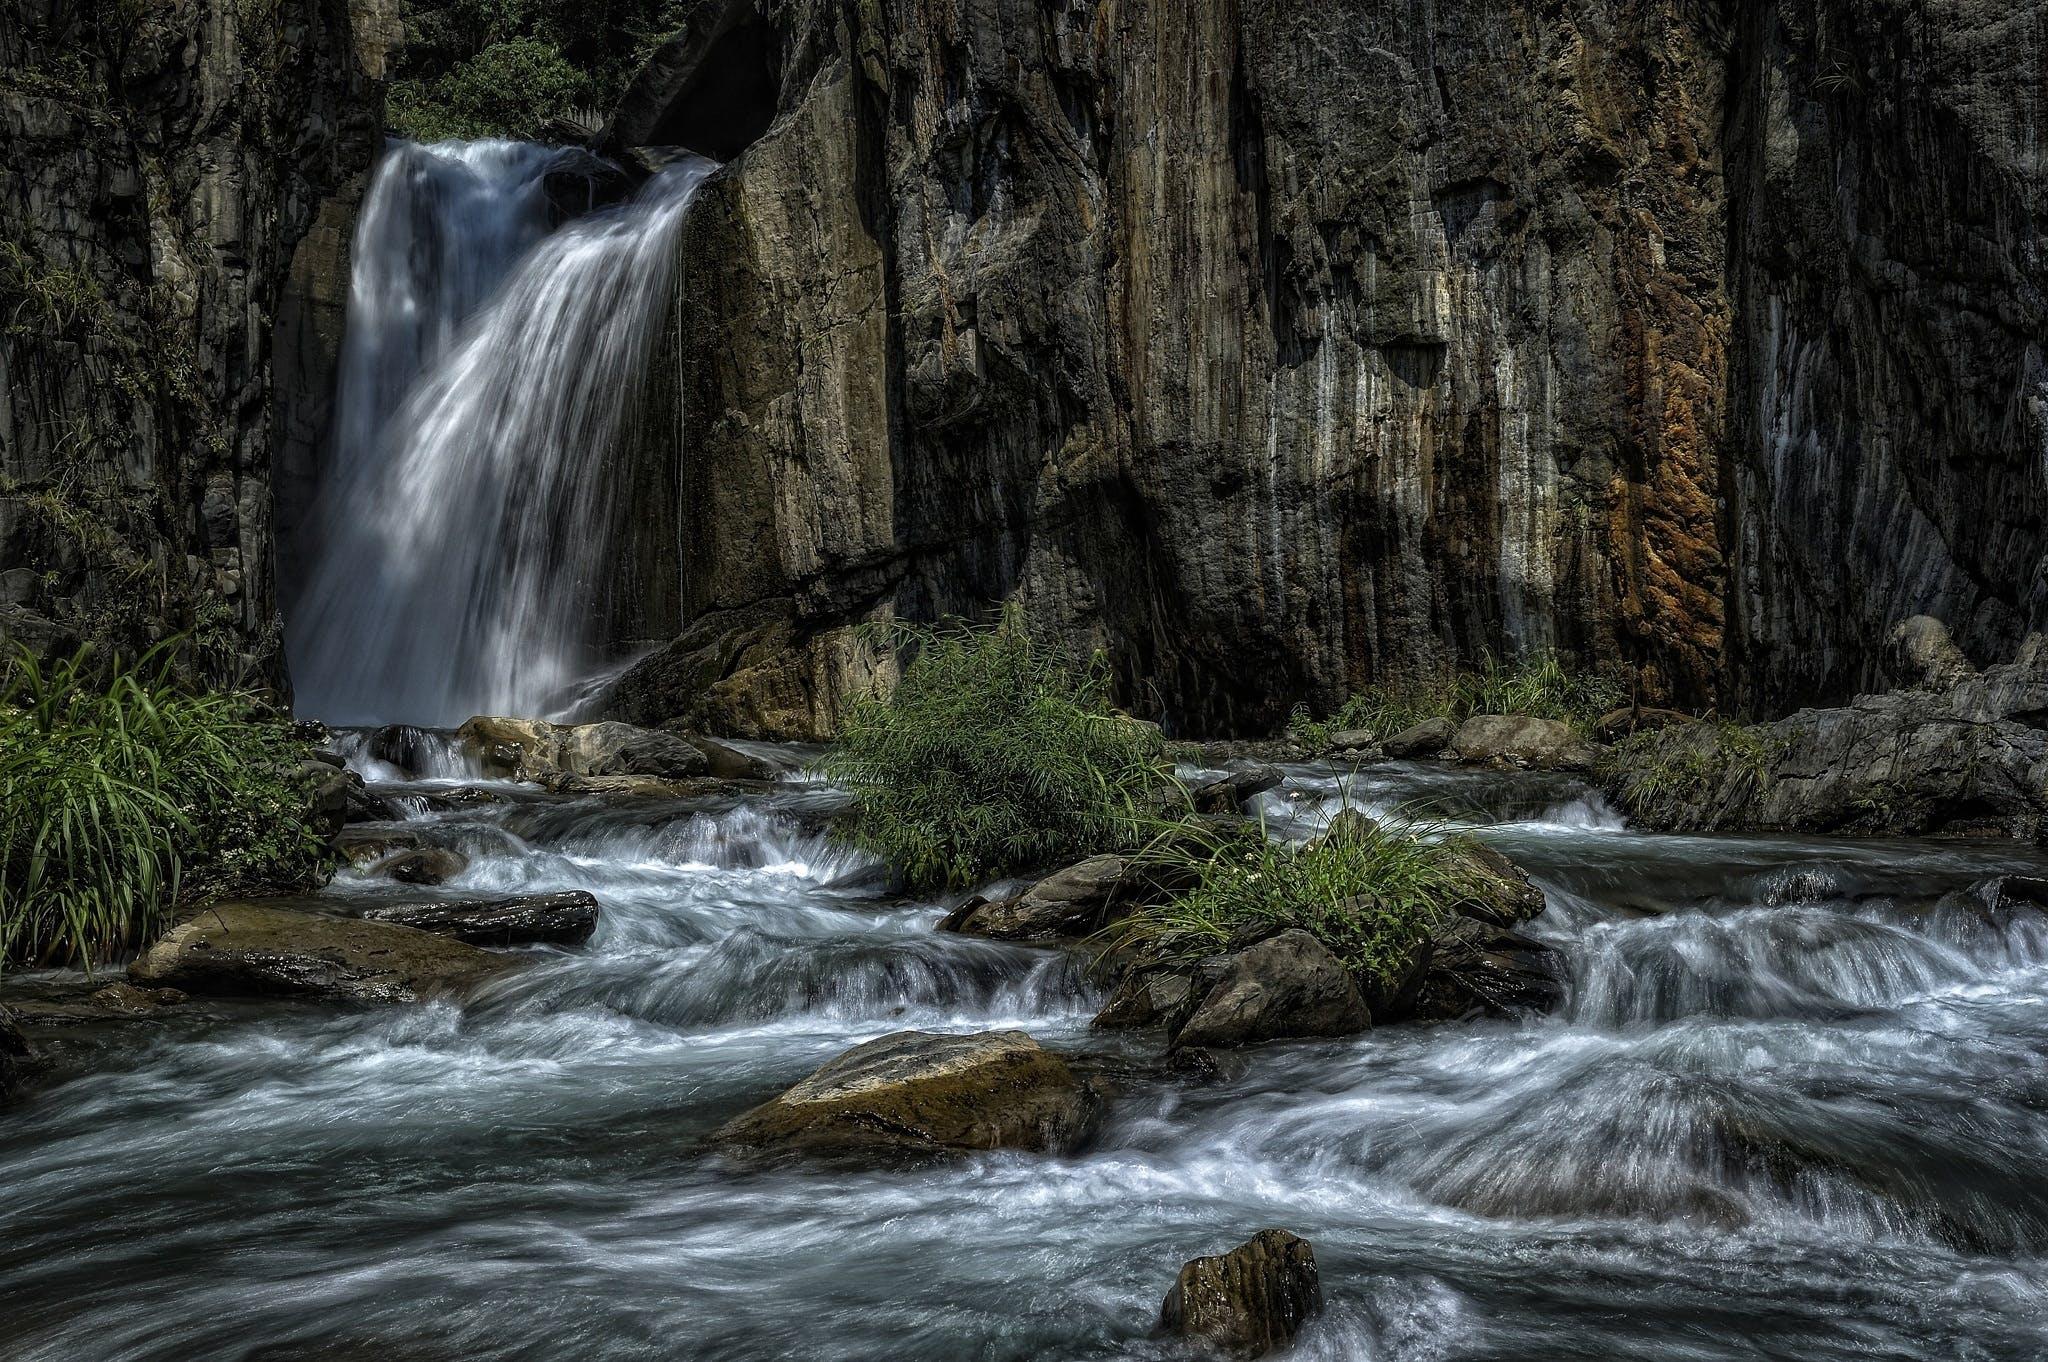 Free stock photo of nature, water, rocks, creek